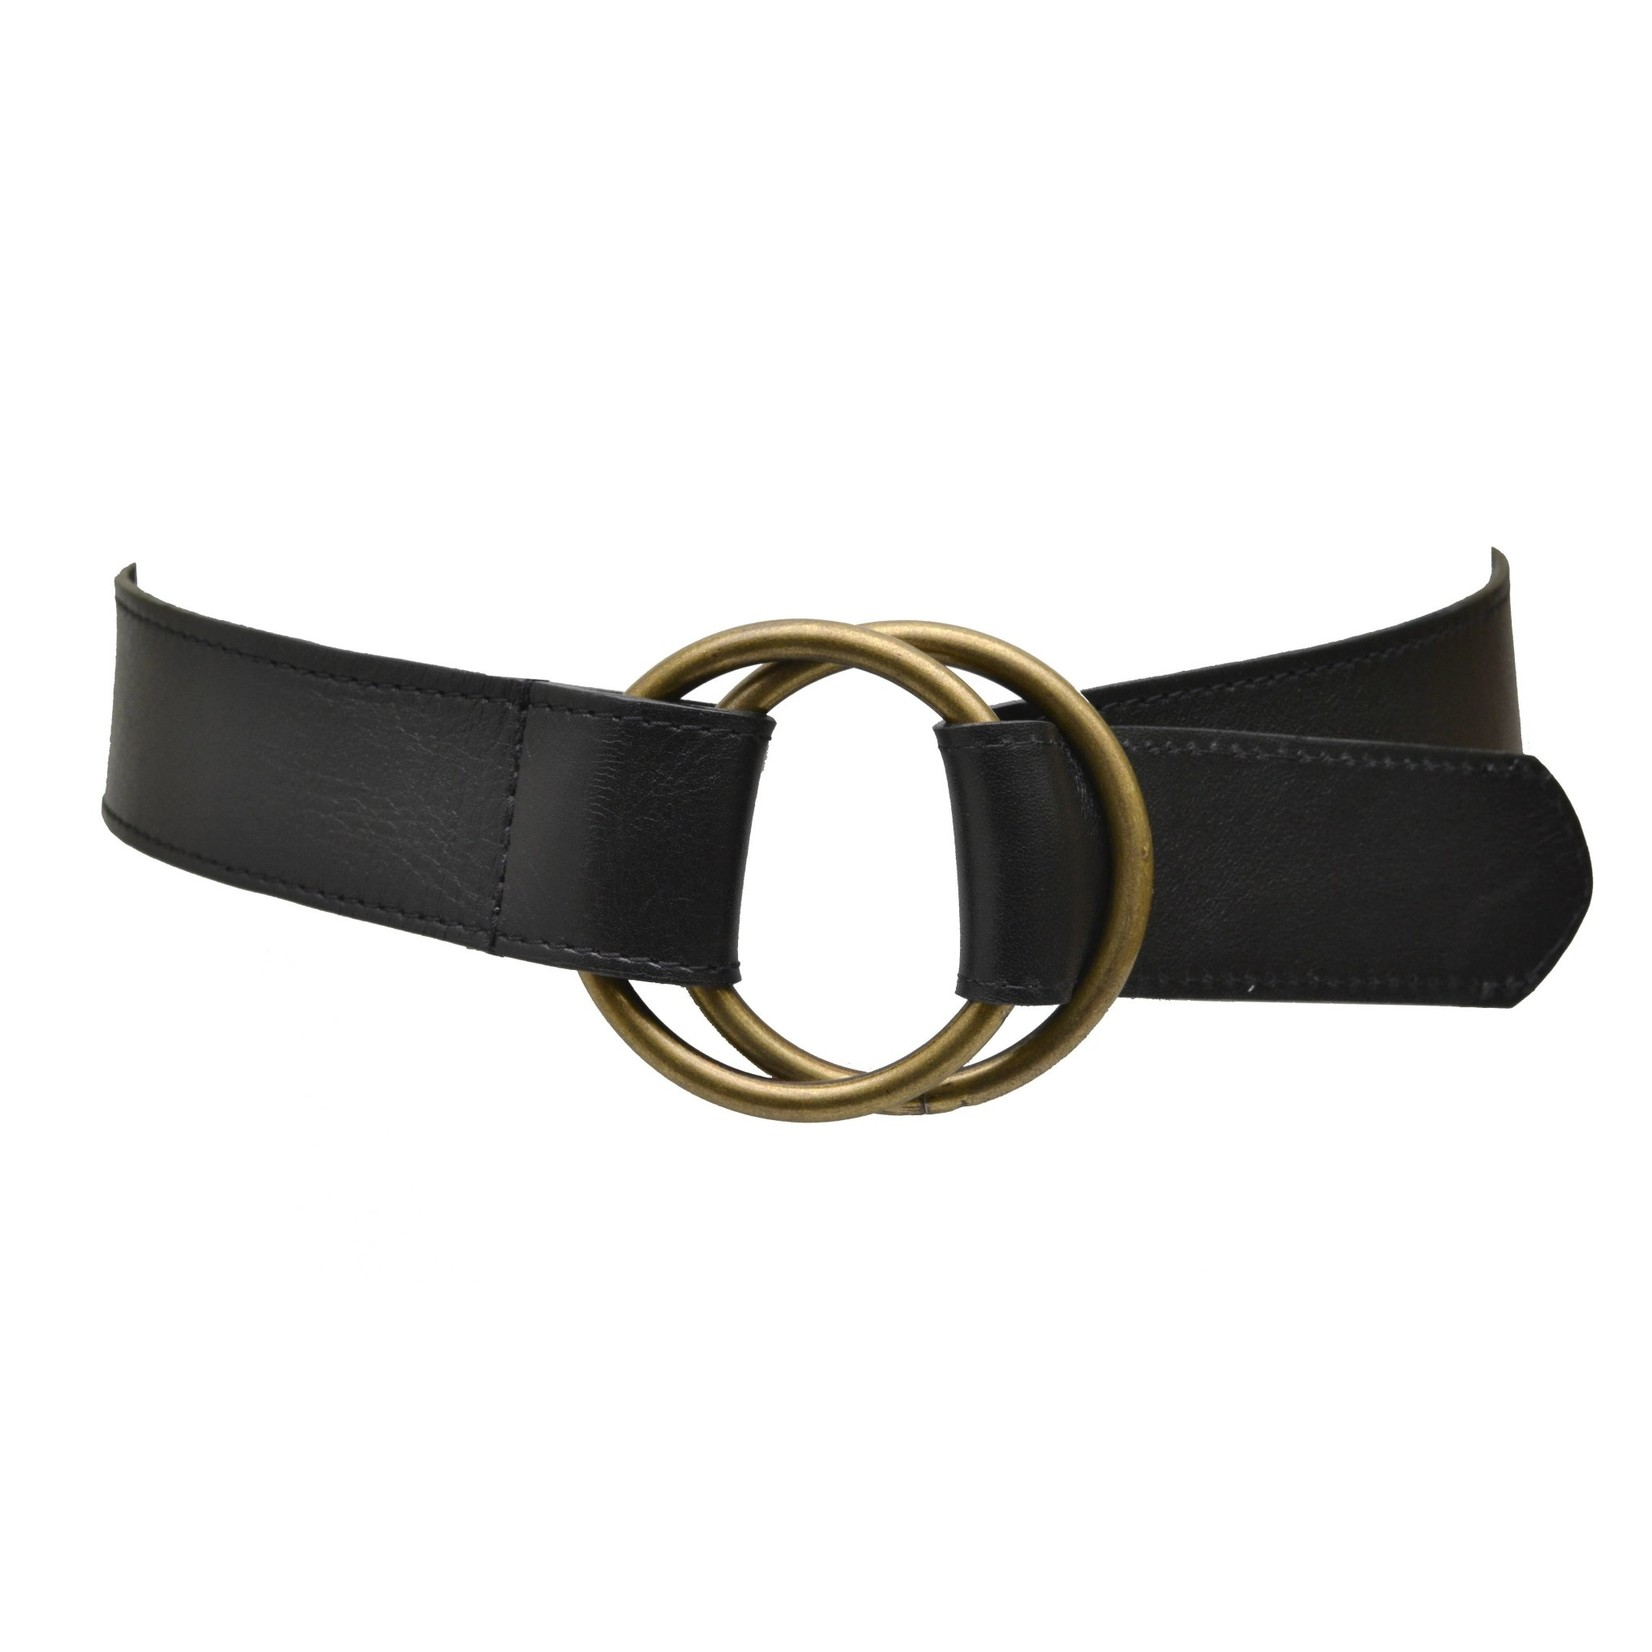 ADA Josie Double Ring Leather Belt in Black